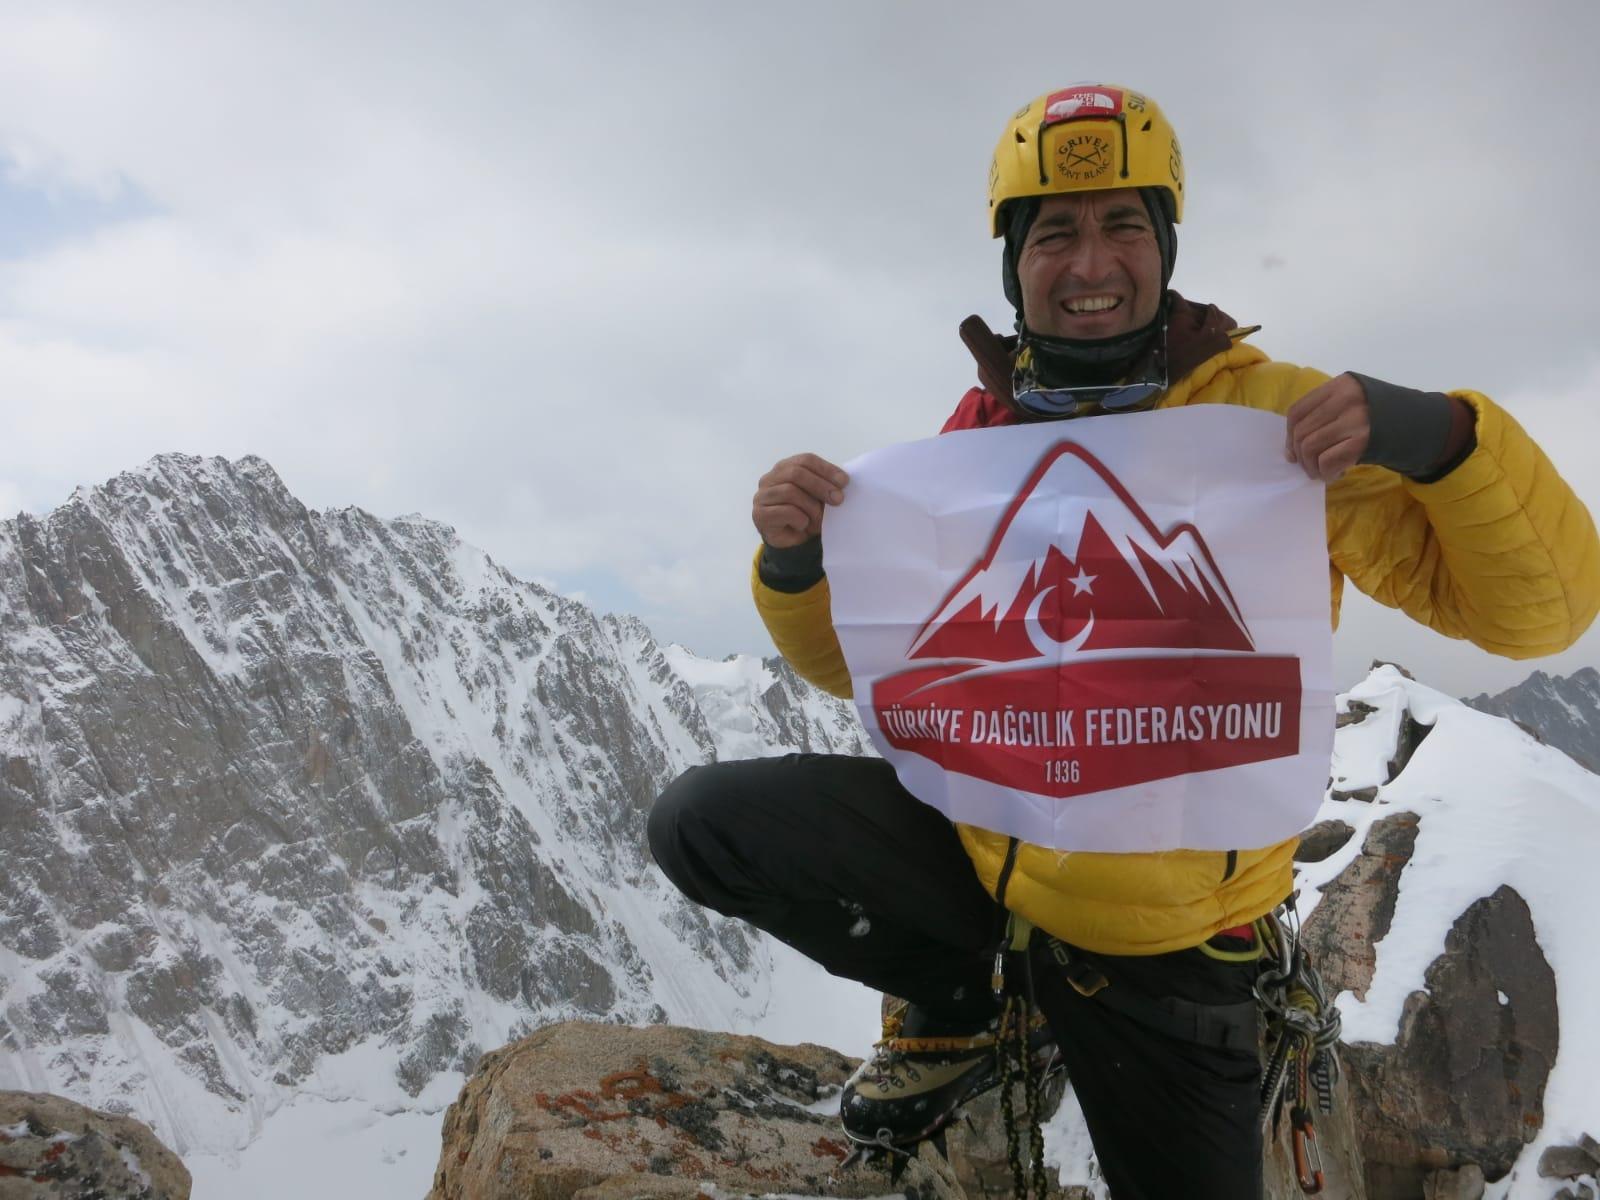 TDF 2018 Proje Bazlı Tırmanışlarından Ala Archa Tırmanışı tamamlandı.